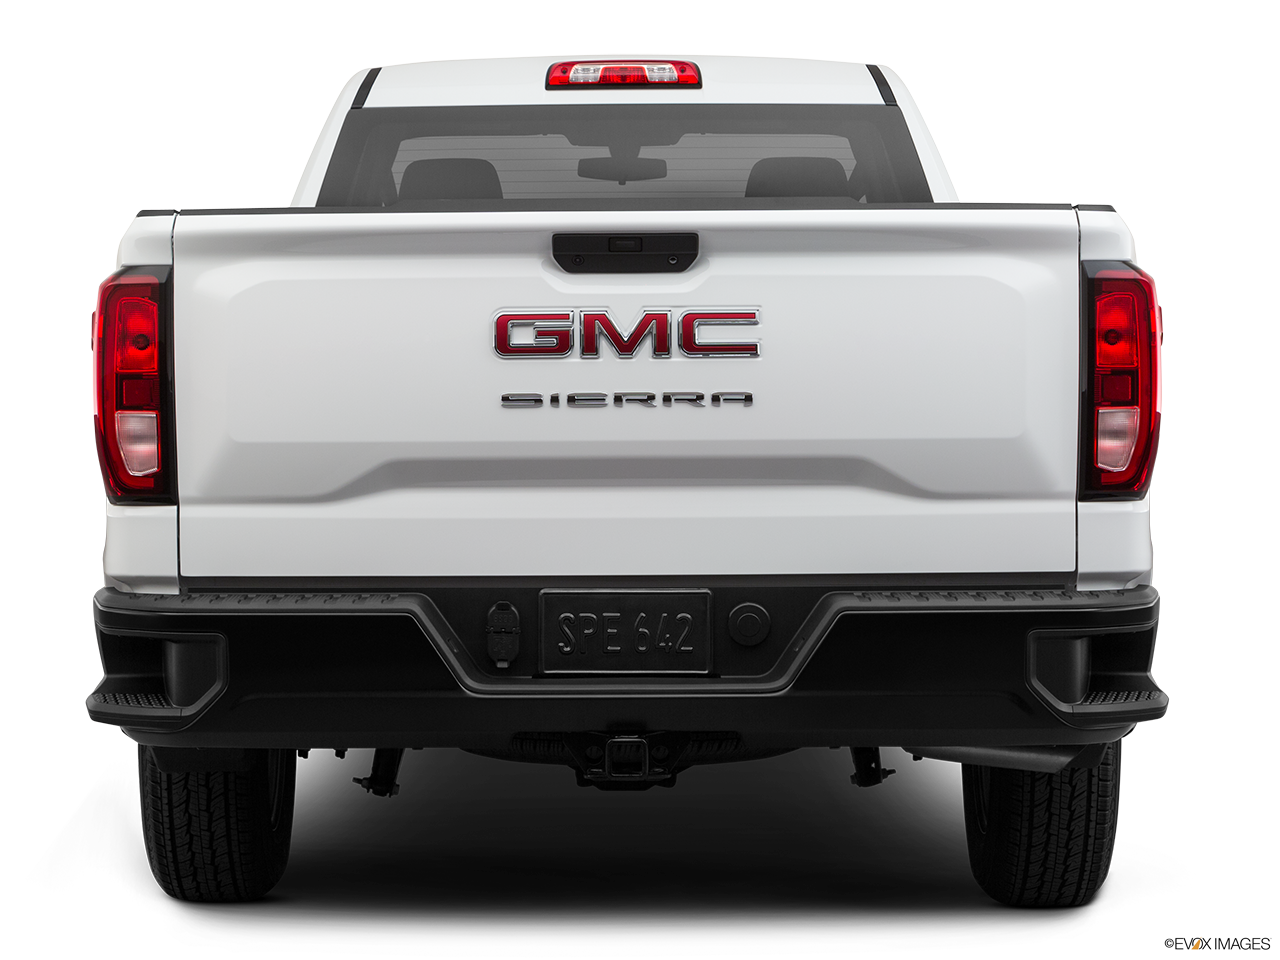 2019 GMC Sierra 1500 photo